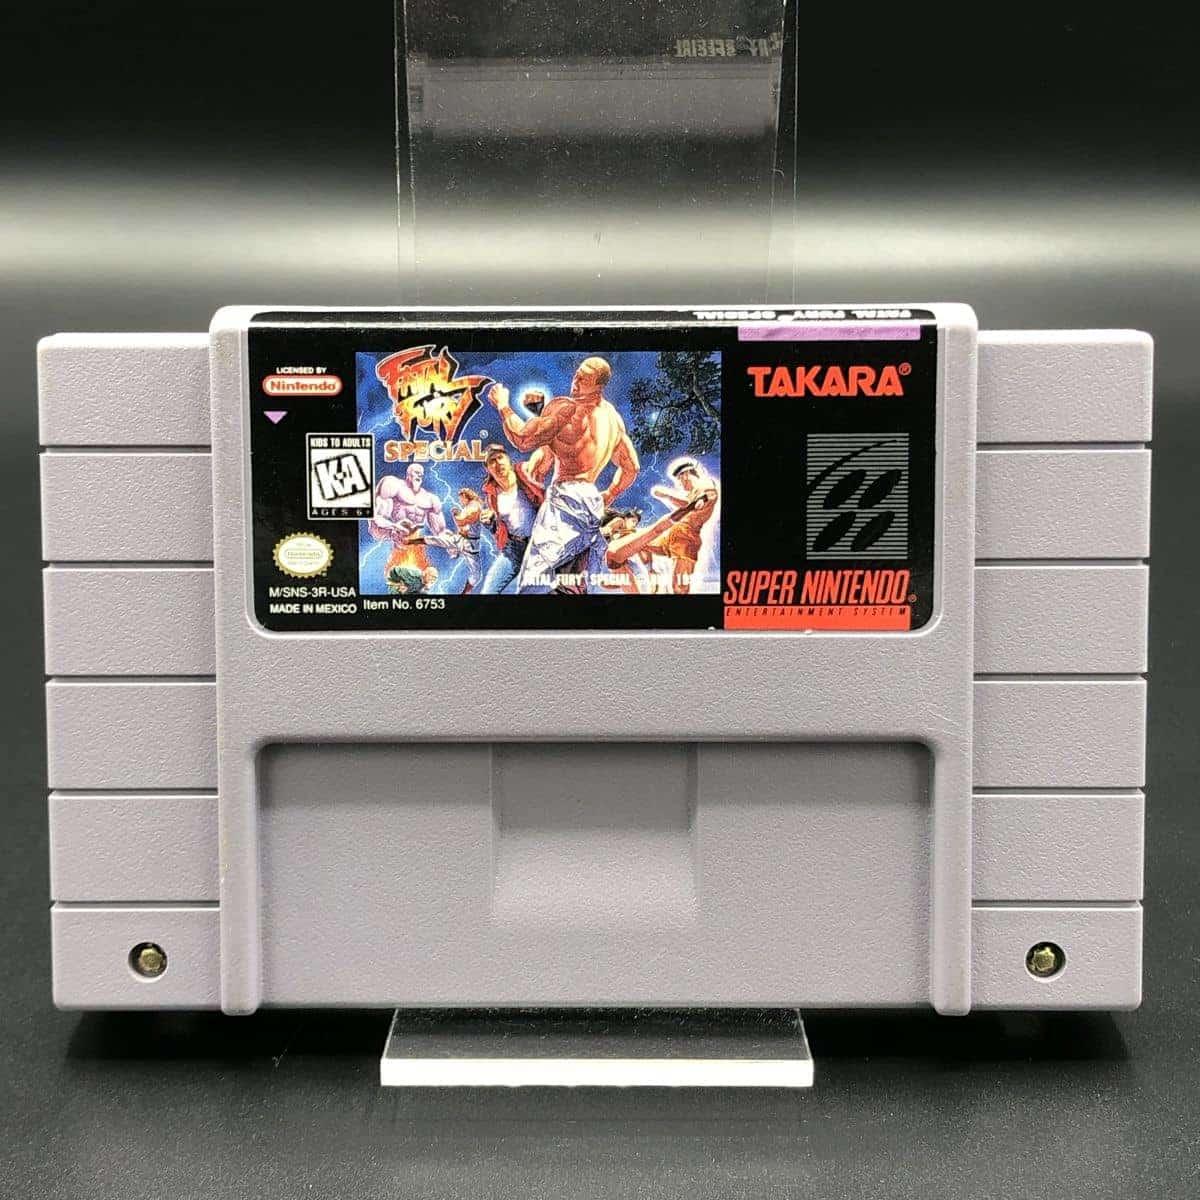 SNES Fatal Fury Special (Import) (Modul) (Gut) Super Nintendo